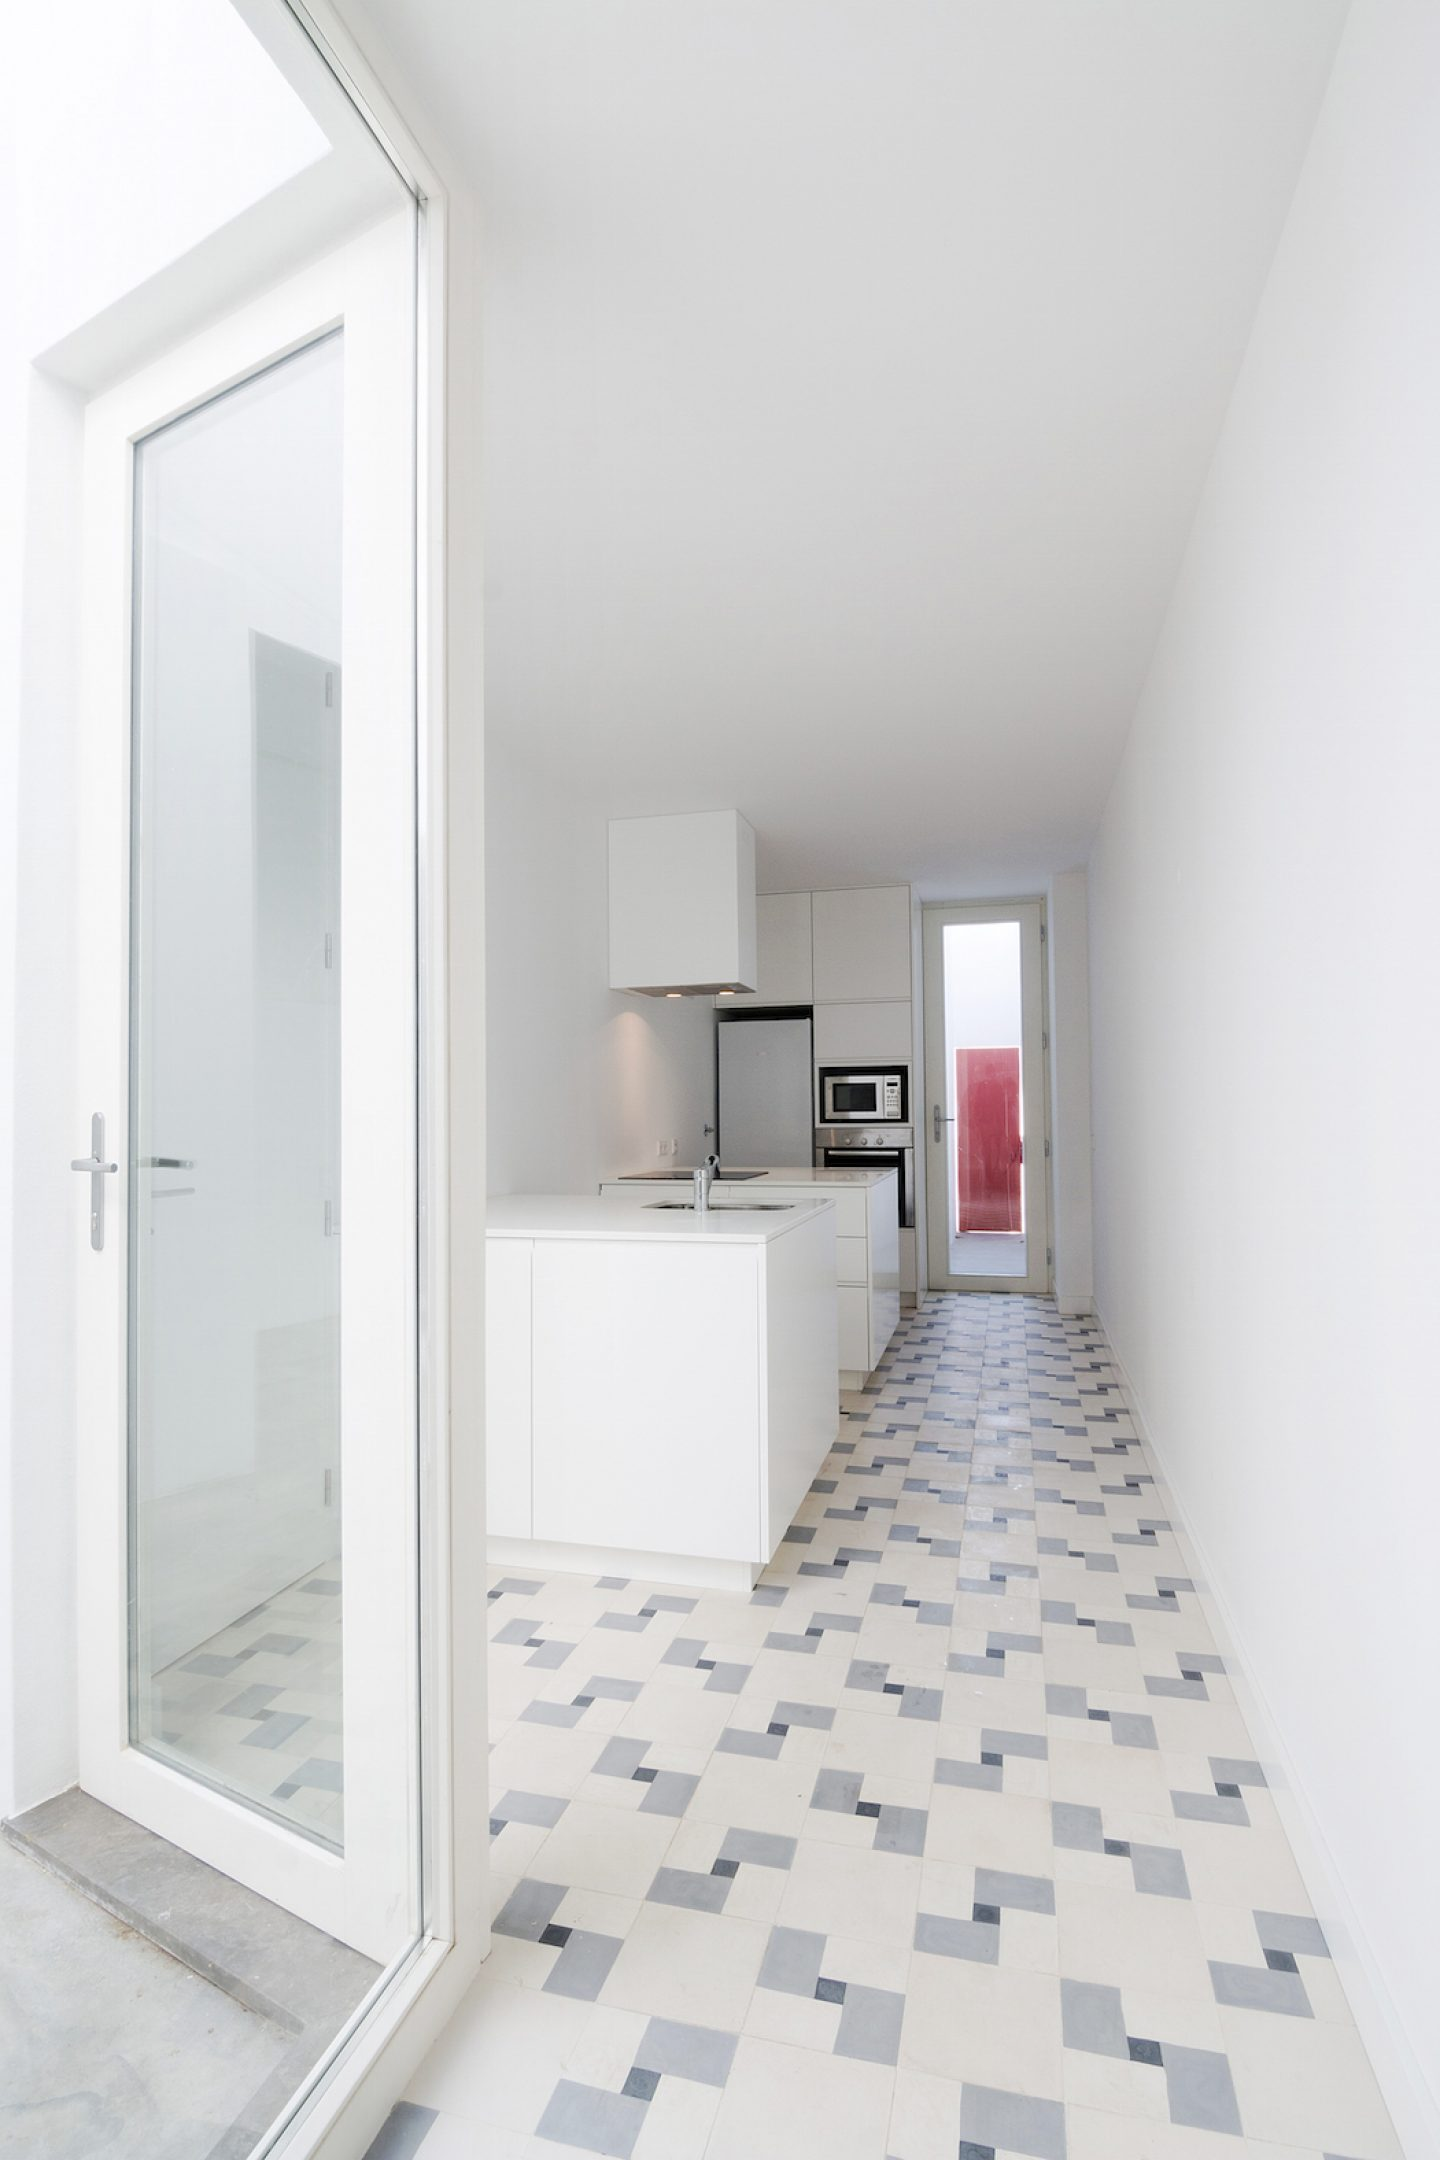 housealm_architecture_004